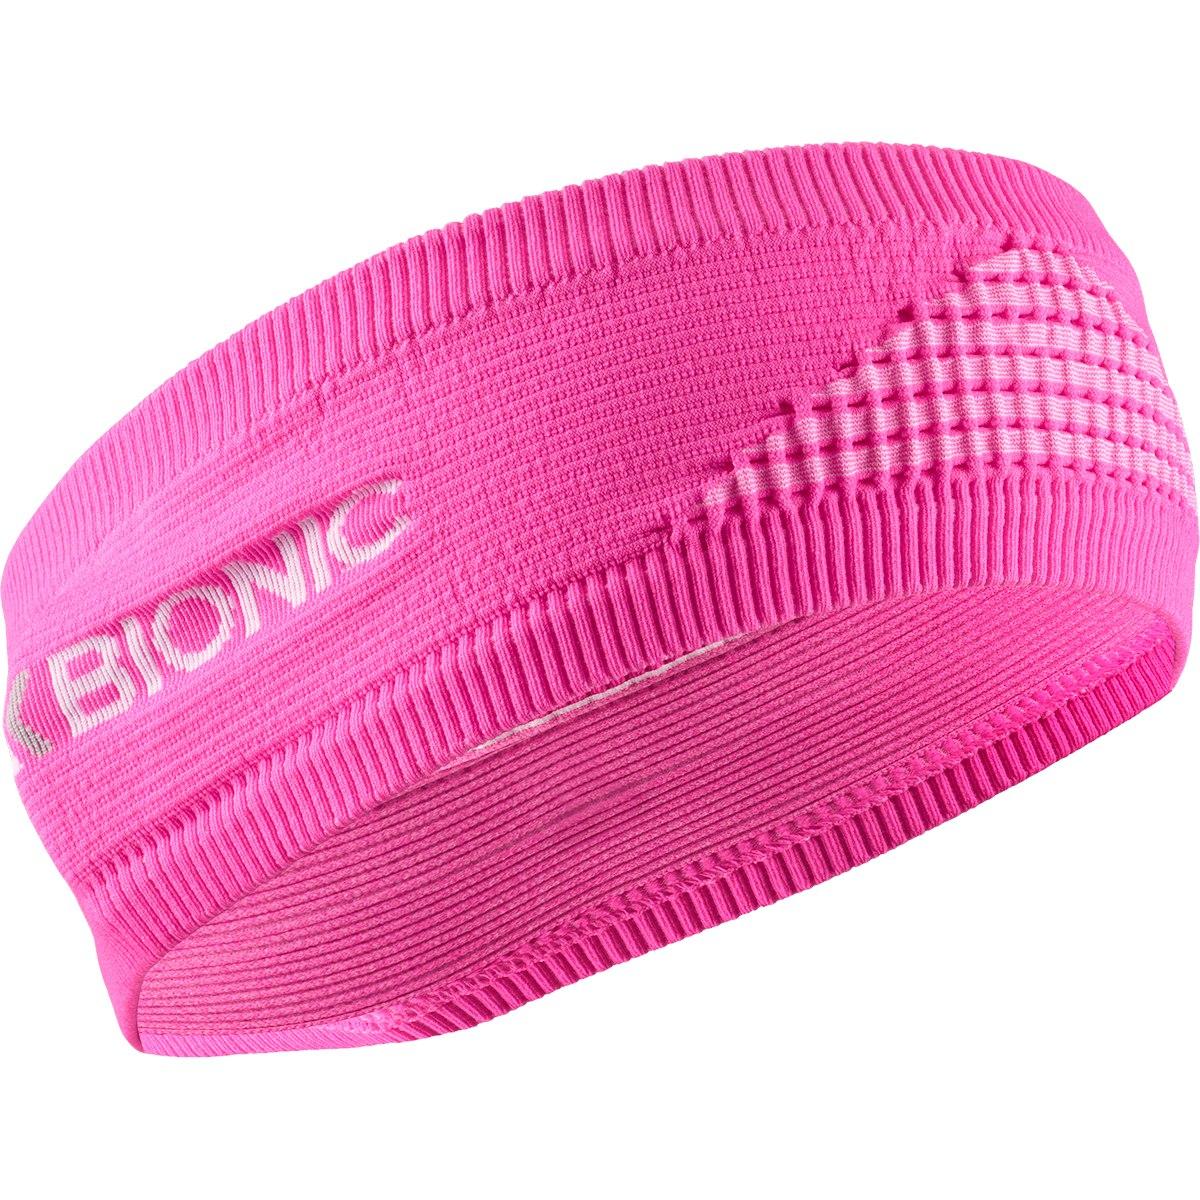 X-Bionic Headband 4.0 - flamingo fire/arctic white